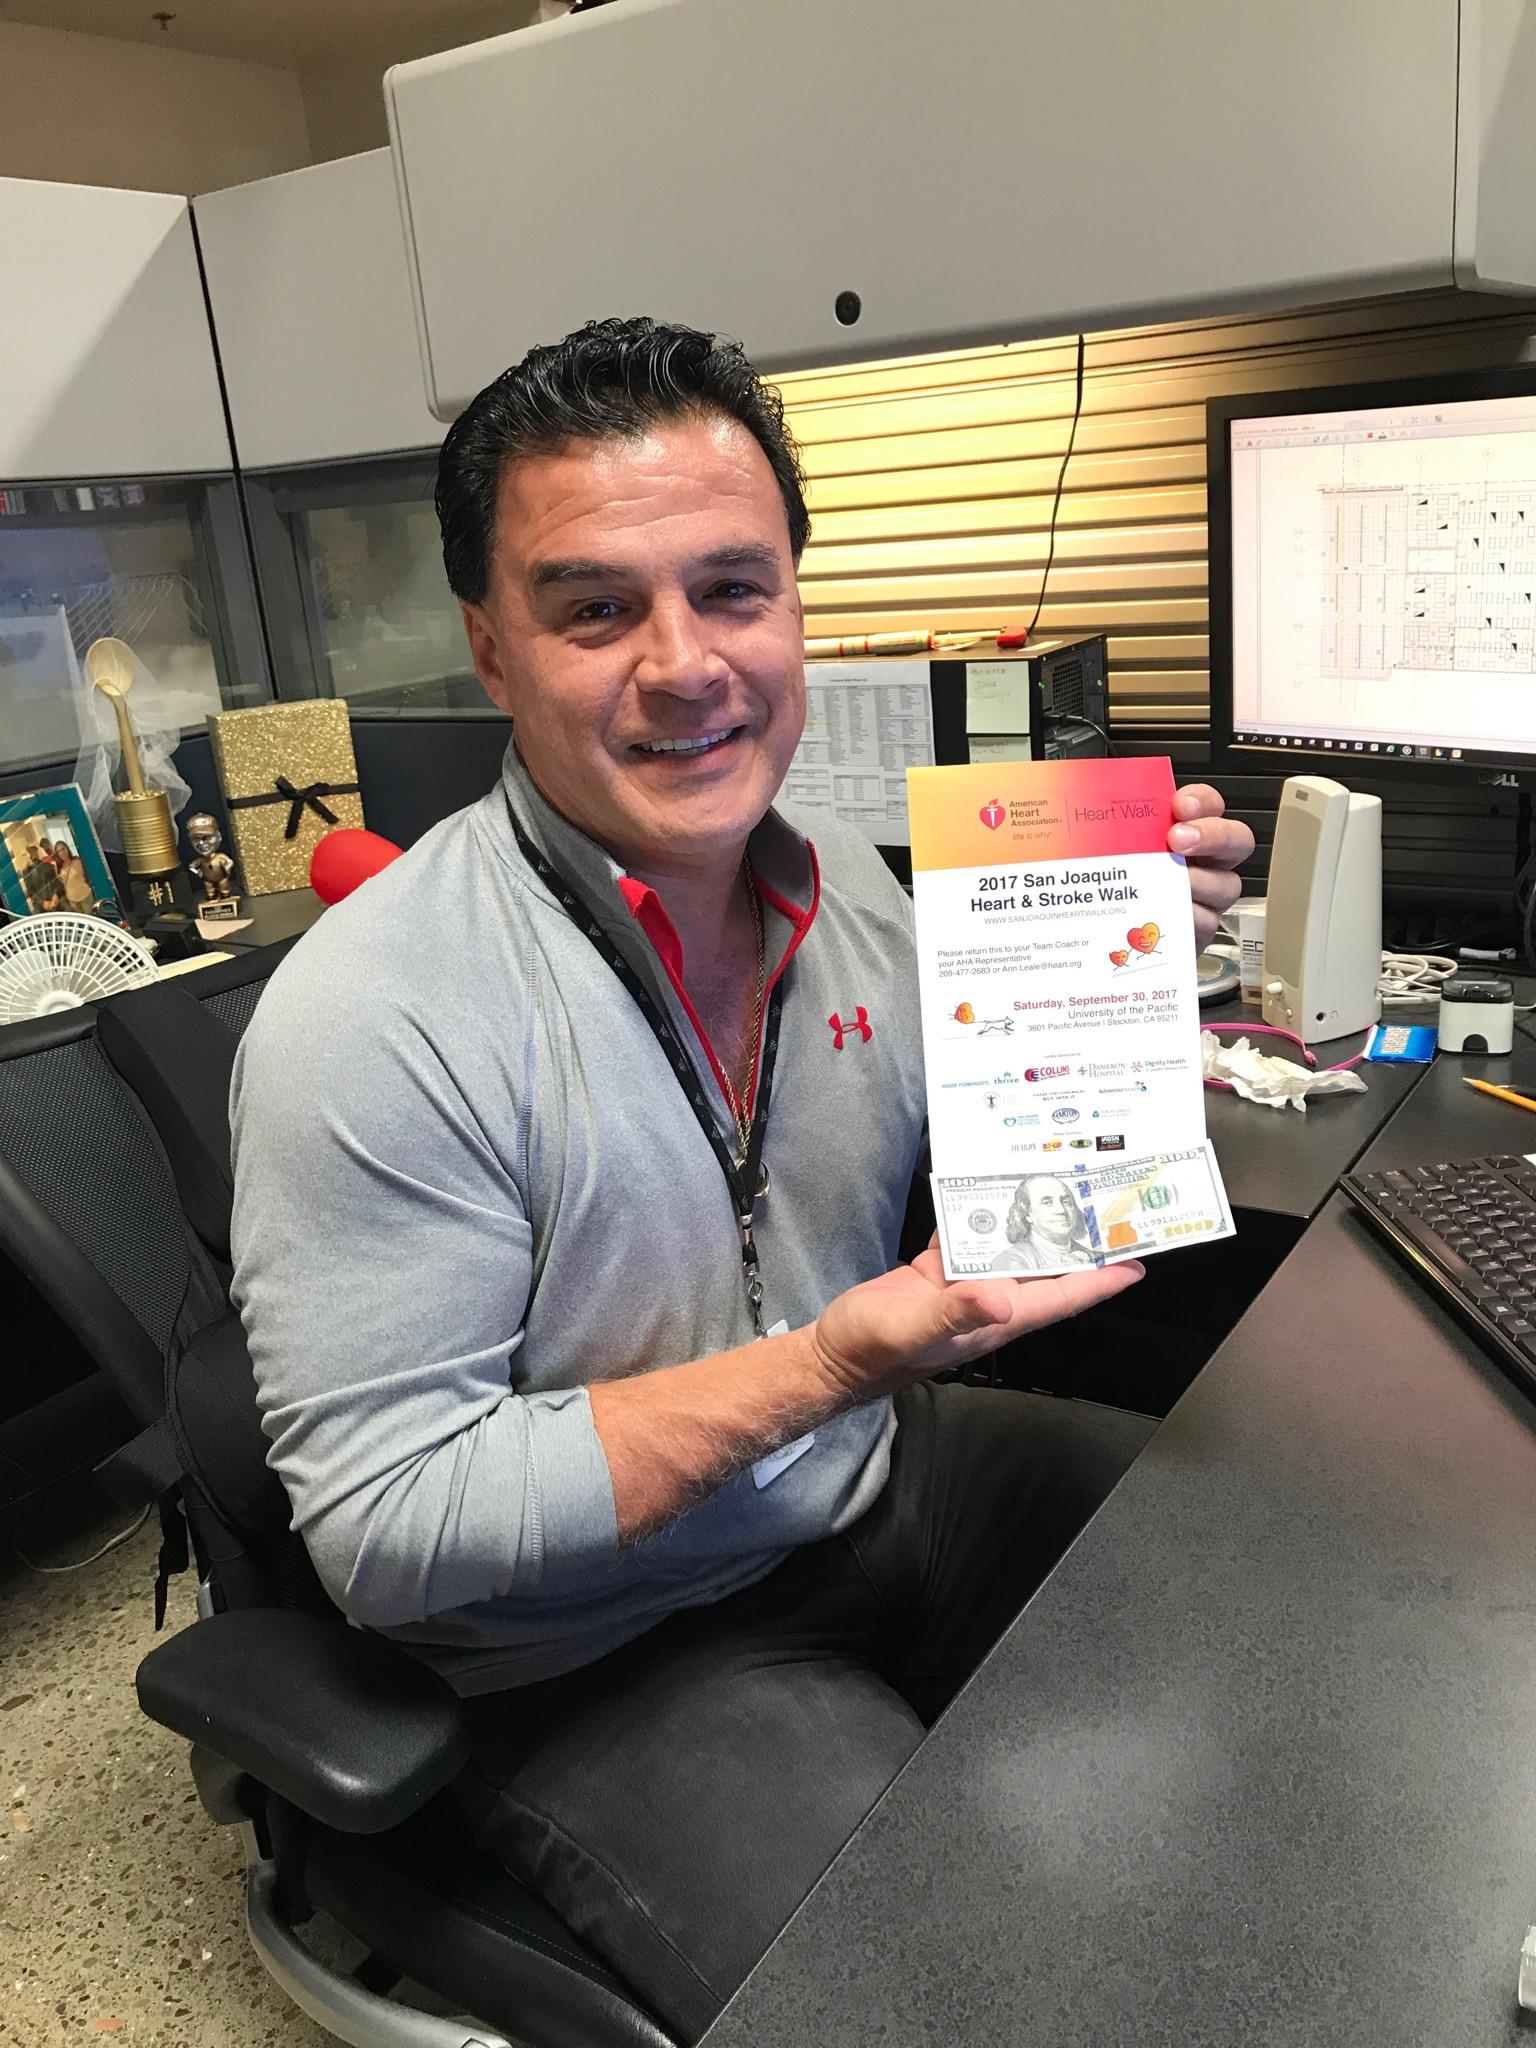 Jorge Donation